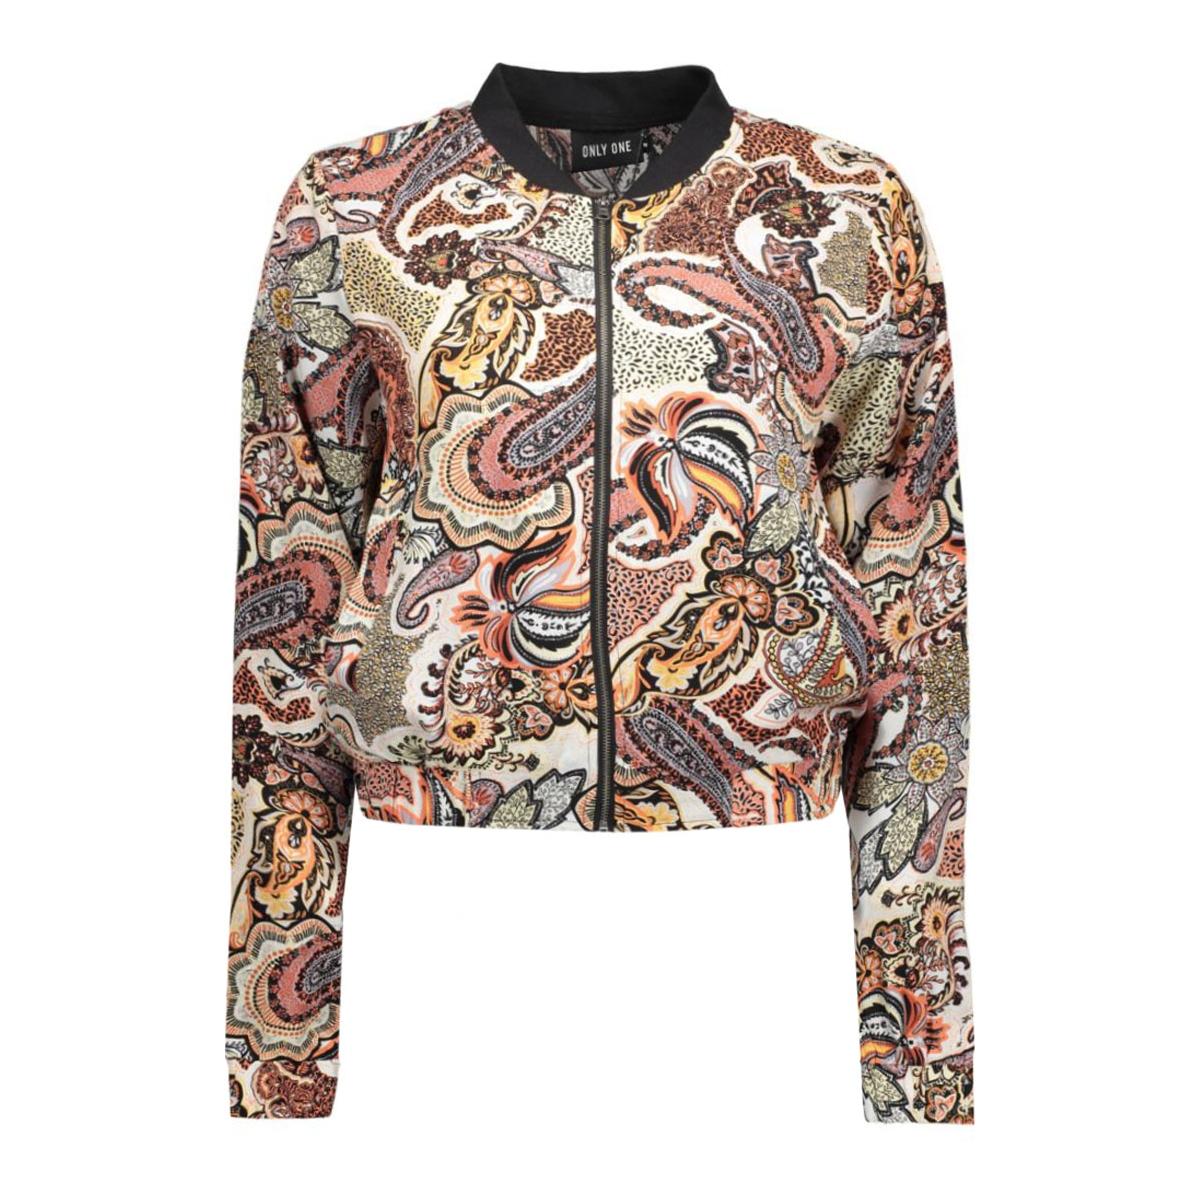 onlmulti cropped l/s bomber jacket 15124481 only jas cloud dancer/paisley